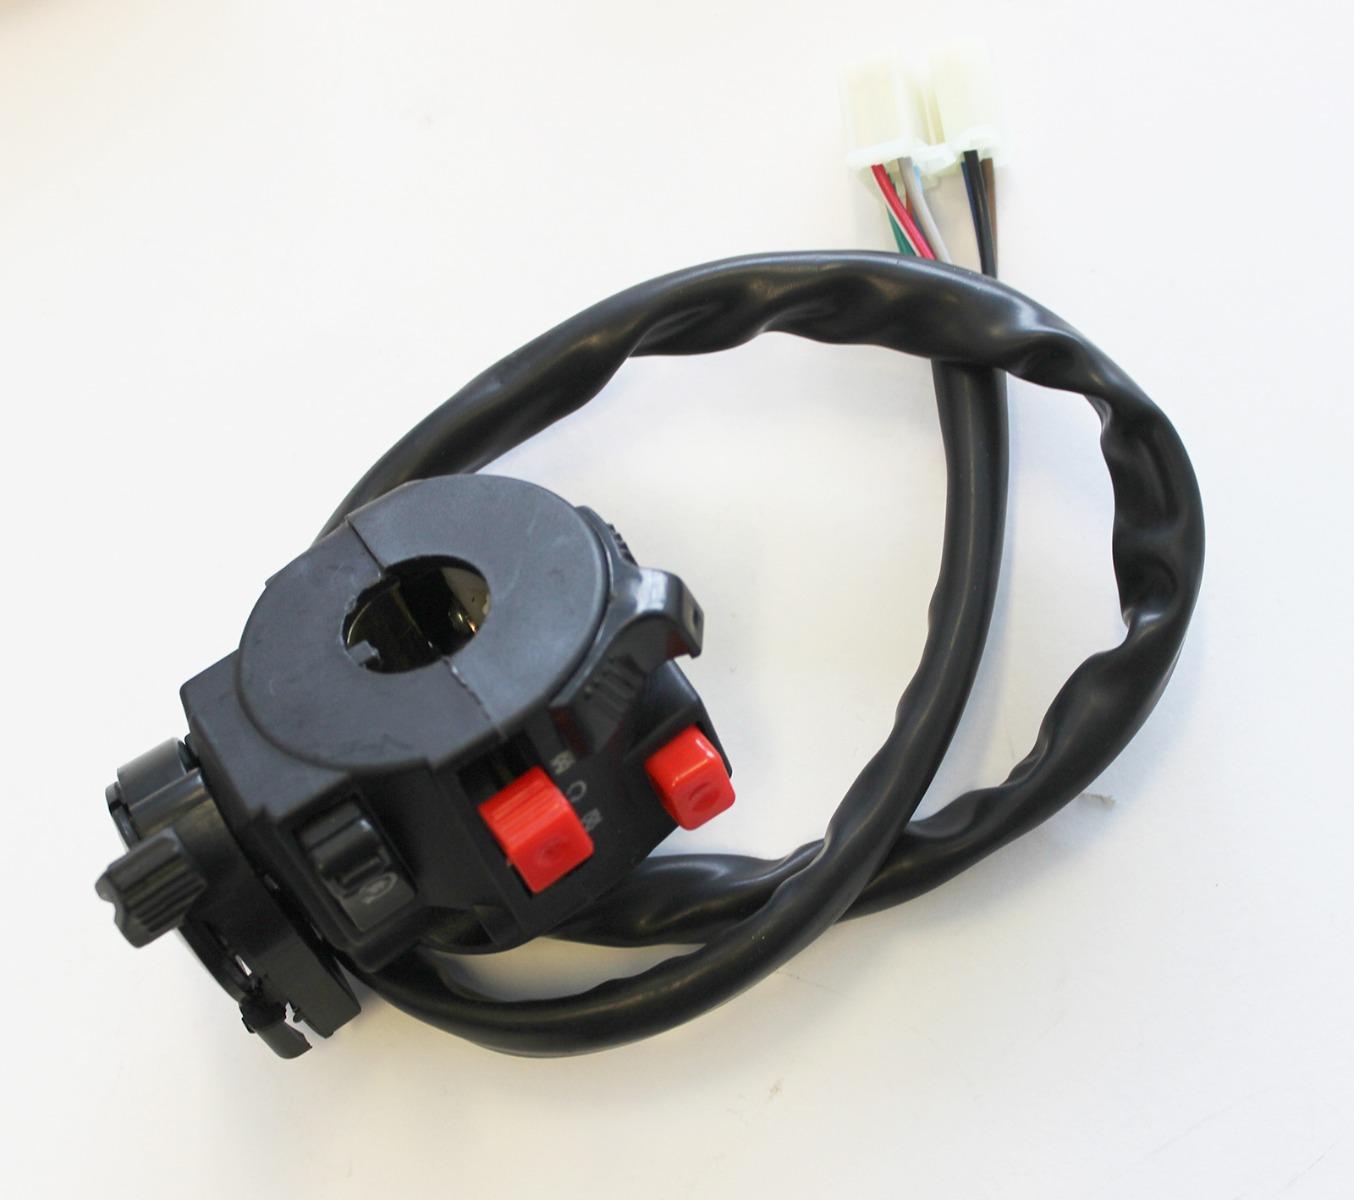 gy cc carby electrics wiring harness quad atv buggy kinroad gy6 150cc carby electrics wiring harness quad atv buggy kinroad twister kandi